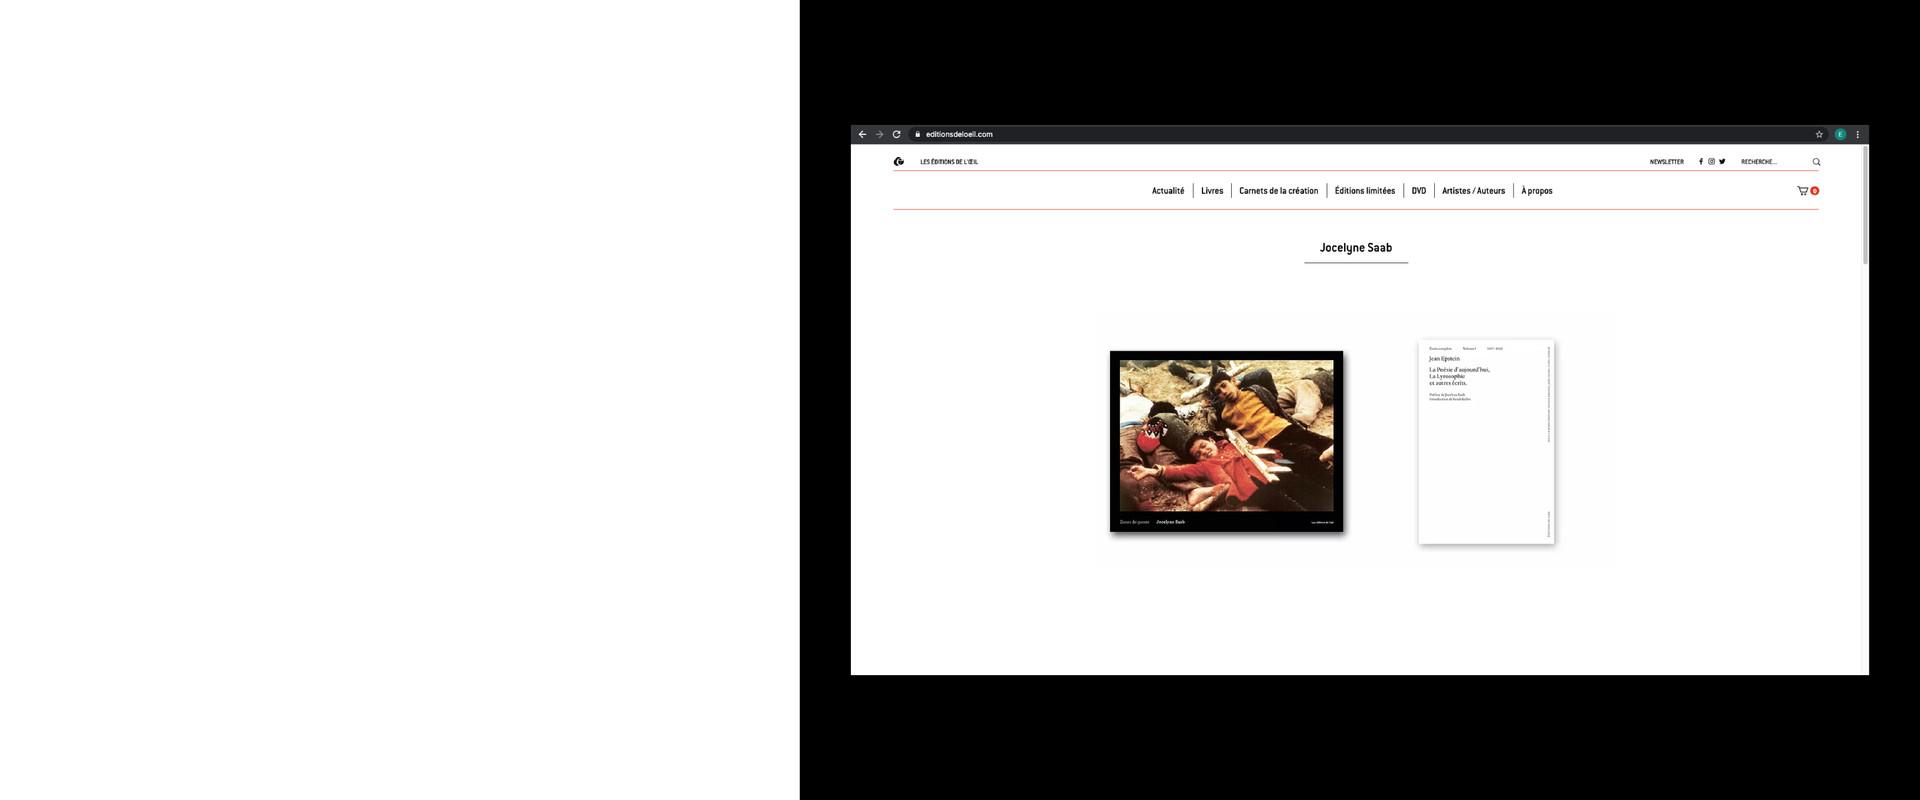 Galerie_site éditiosn de l'œil9.jpg